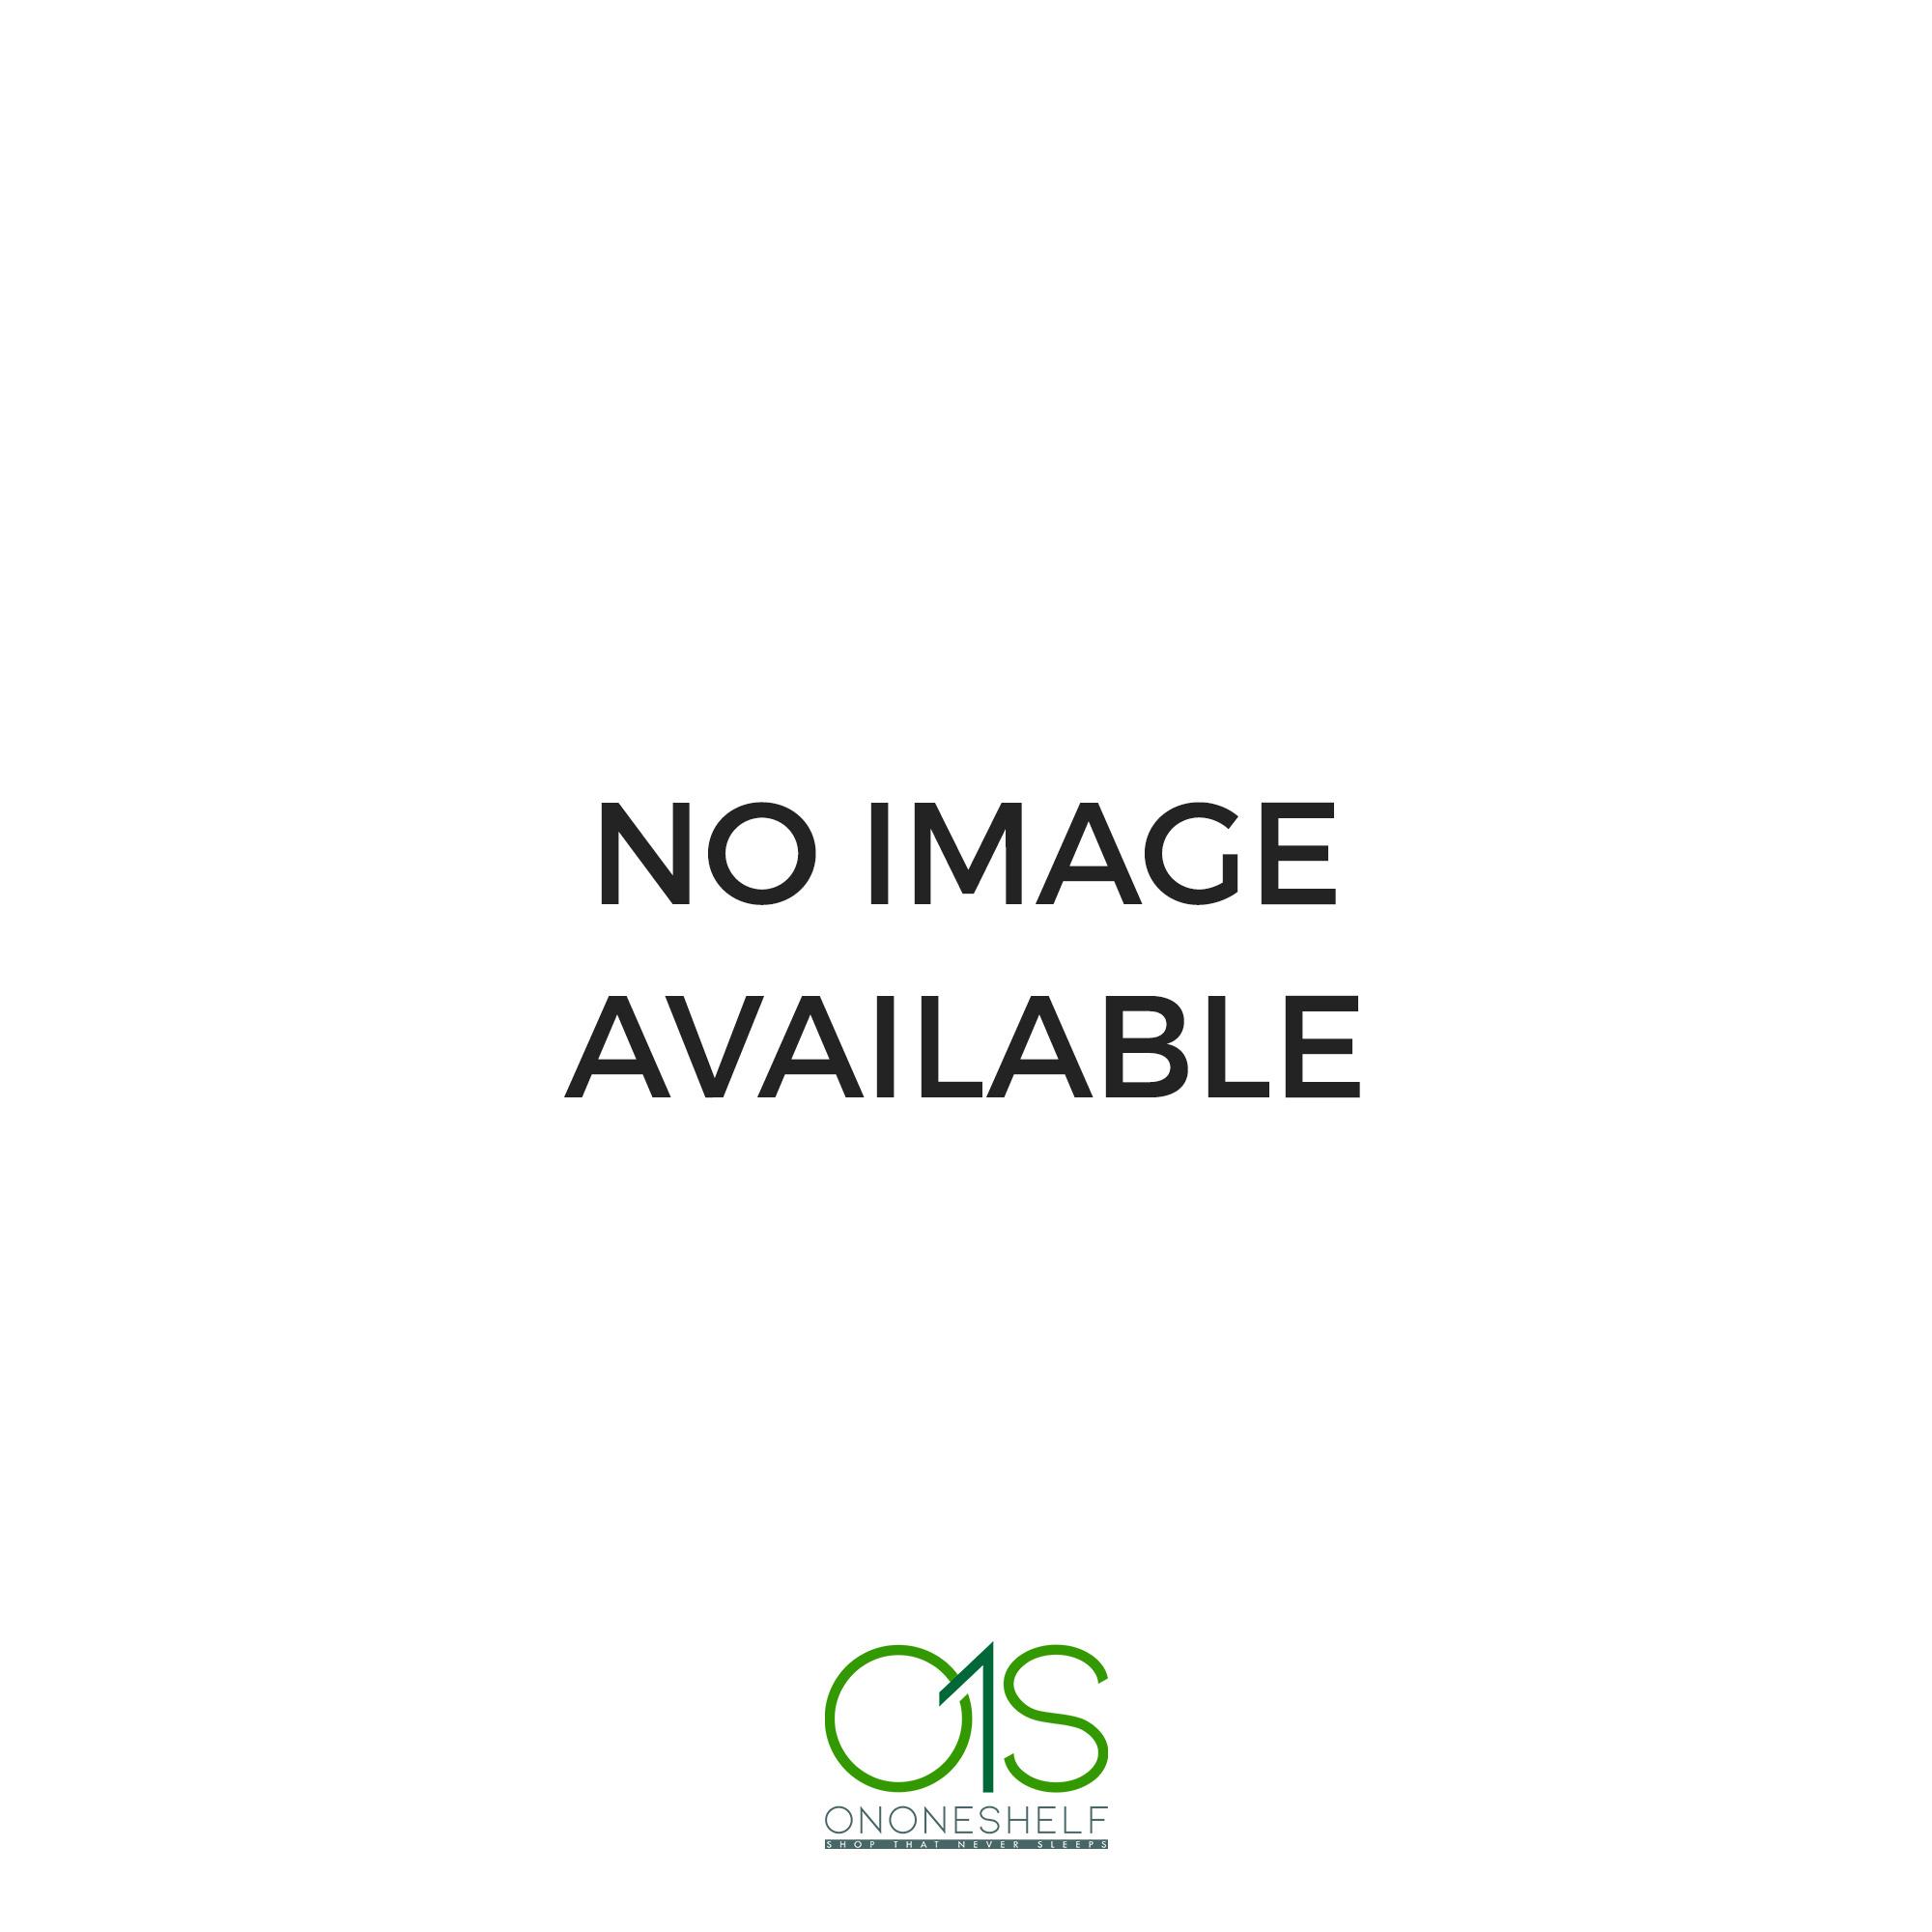 Natural Bamboo 3D Wall Panel Decorative Wall Ceiling Tiles Cladding  Wallpaper Amanda